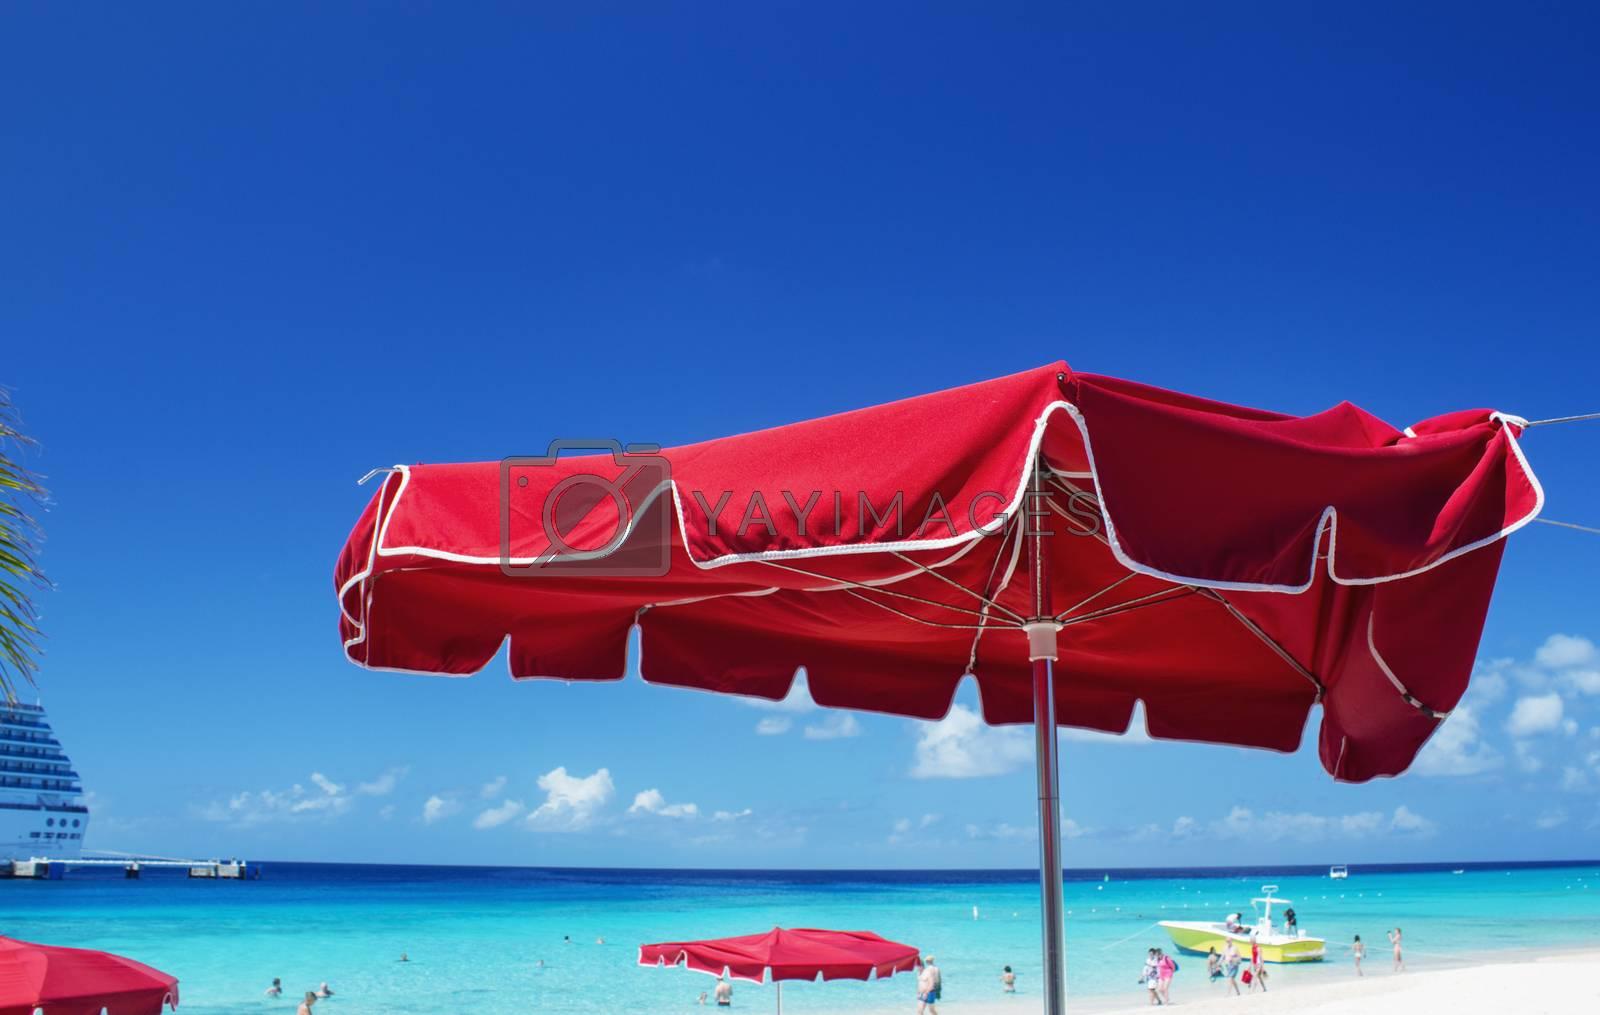 Colourful red umbrella on a tropical beach.